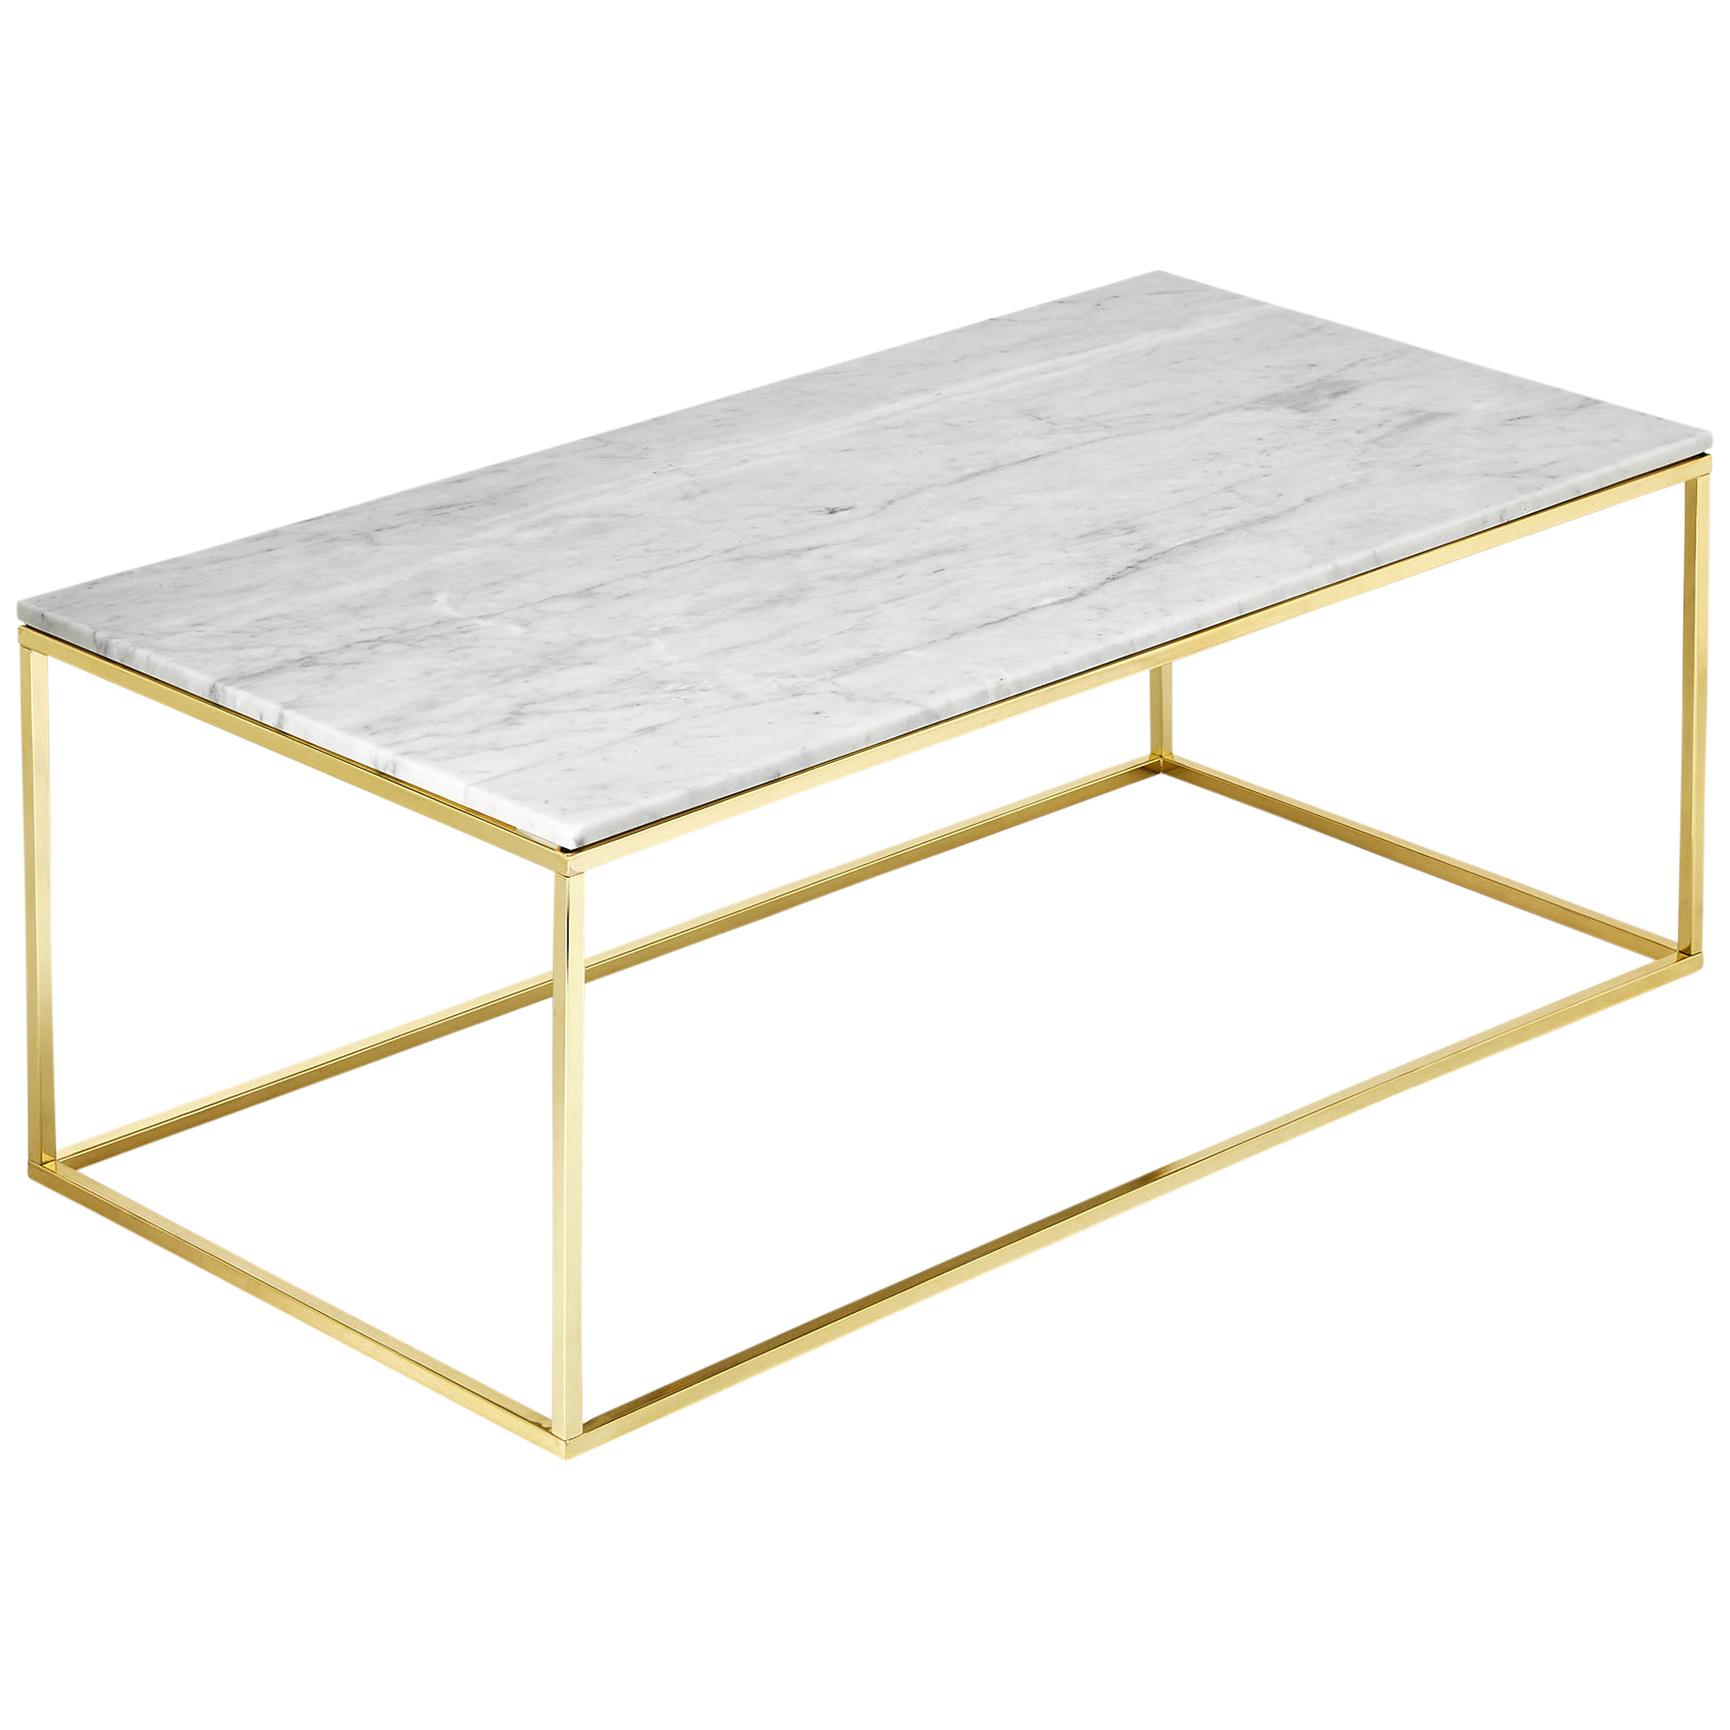 Estudio Furniture Como White Marble Coffee Table Reviews Temple regarding size 1730 X 1730